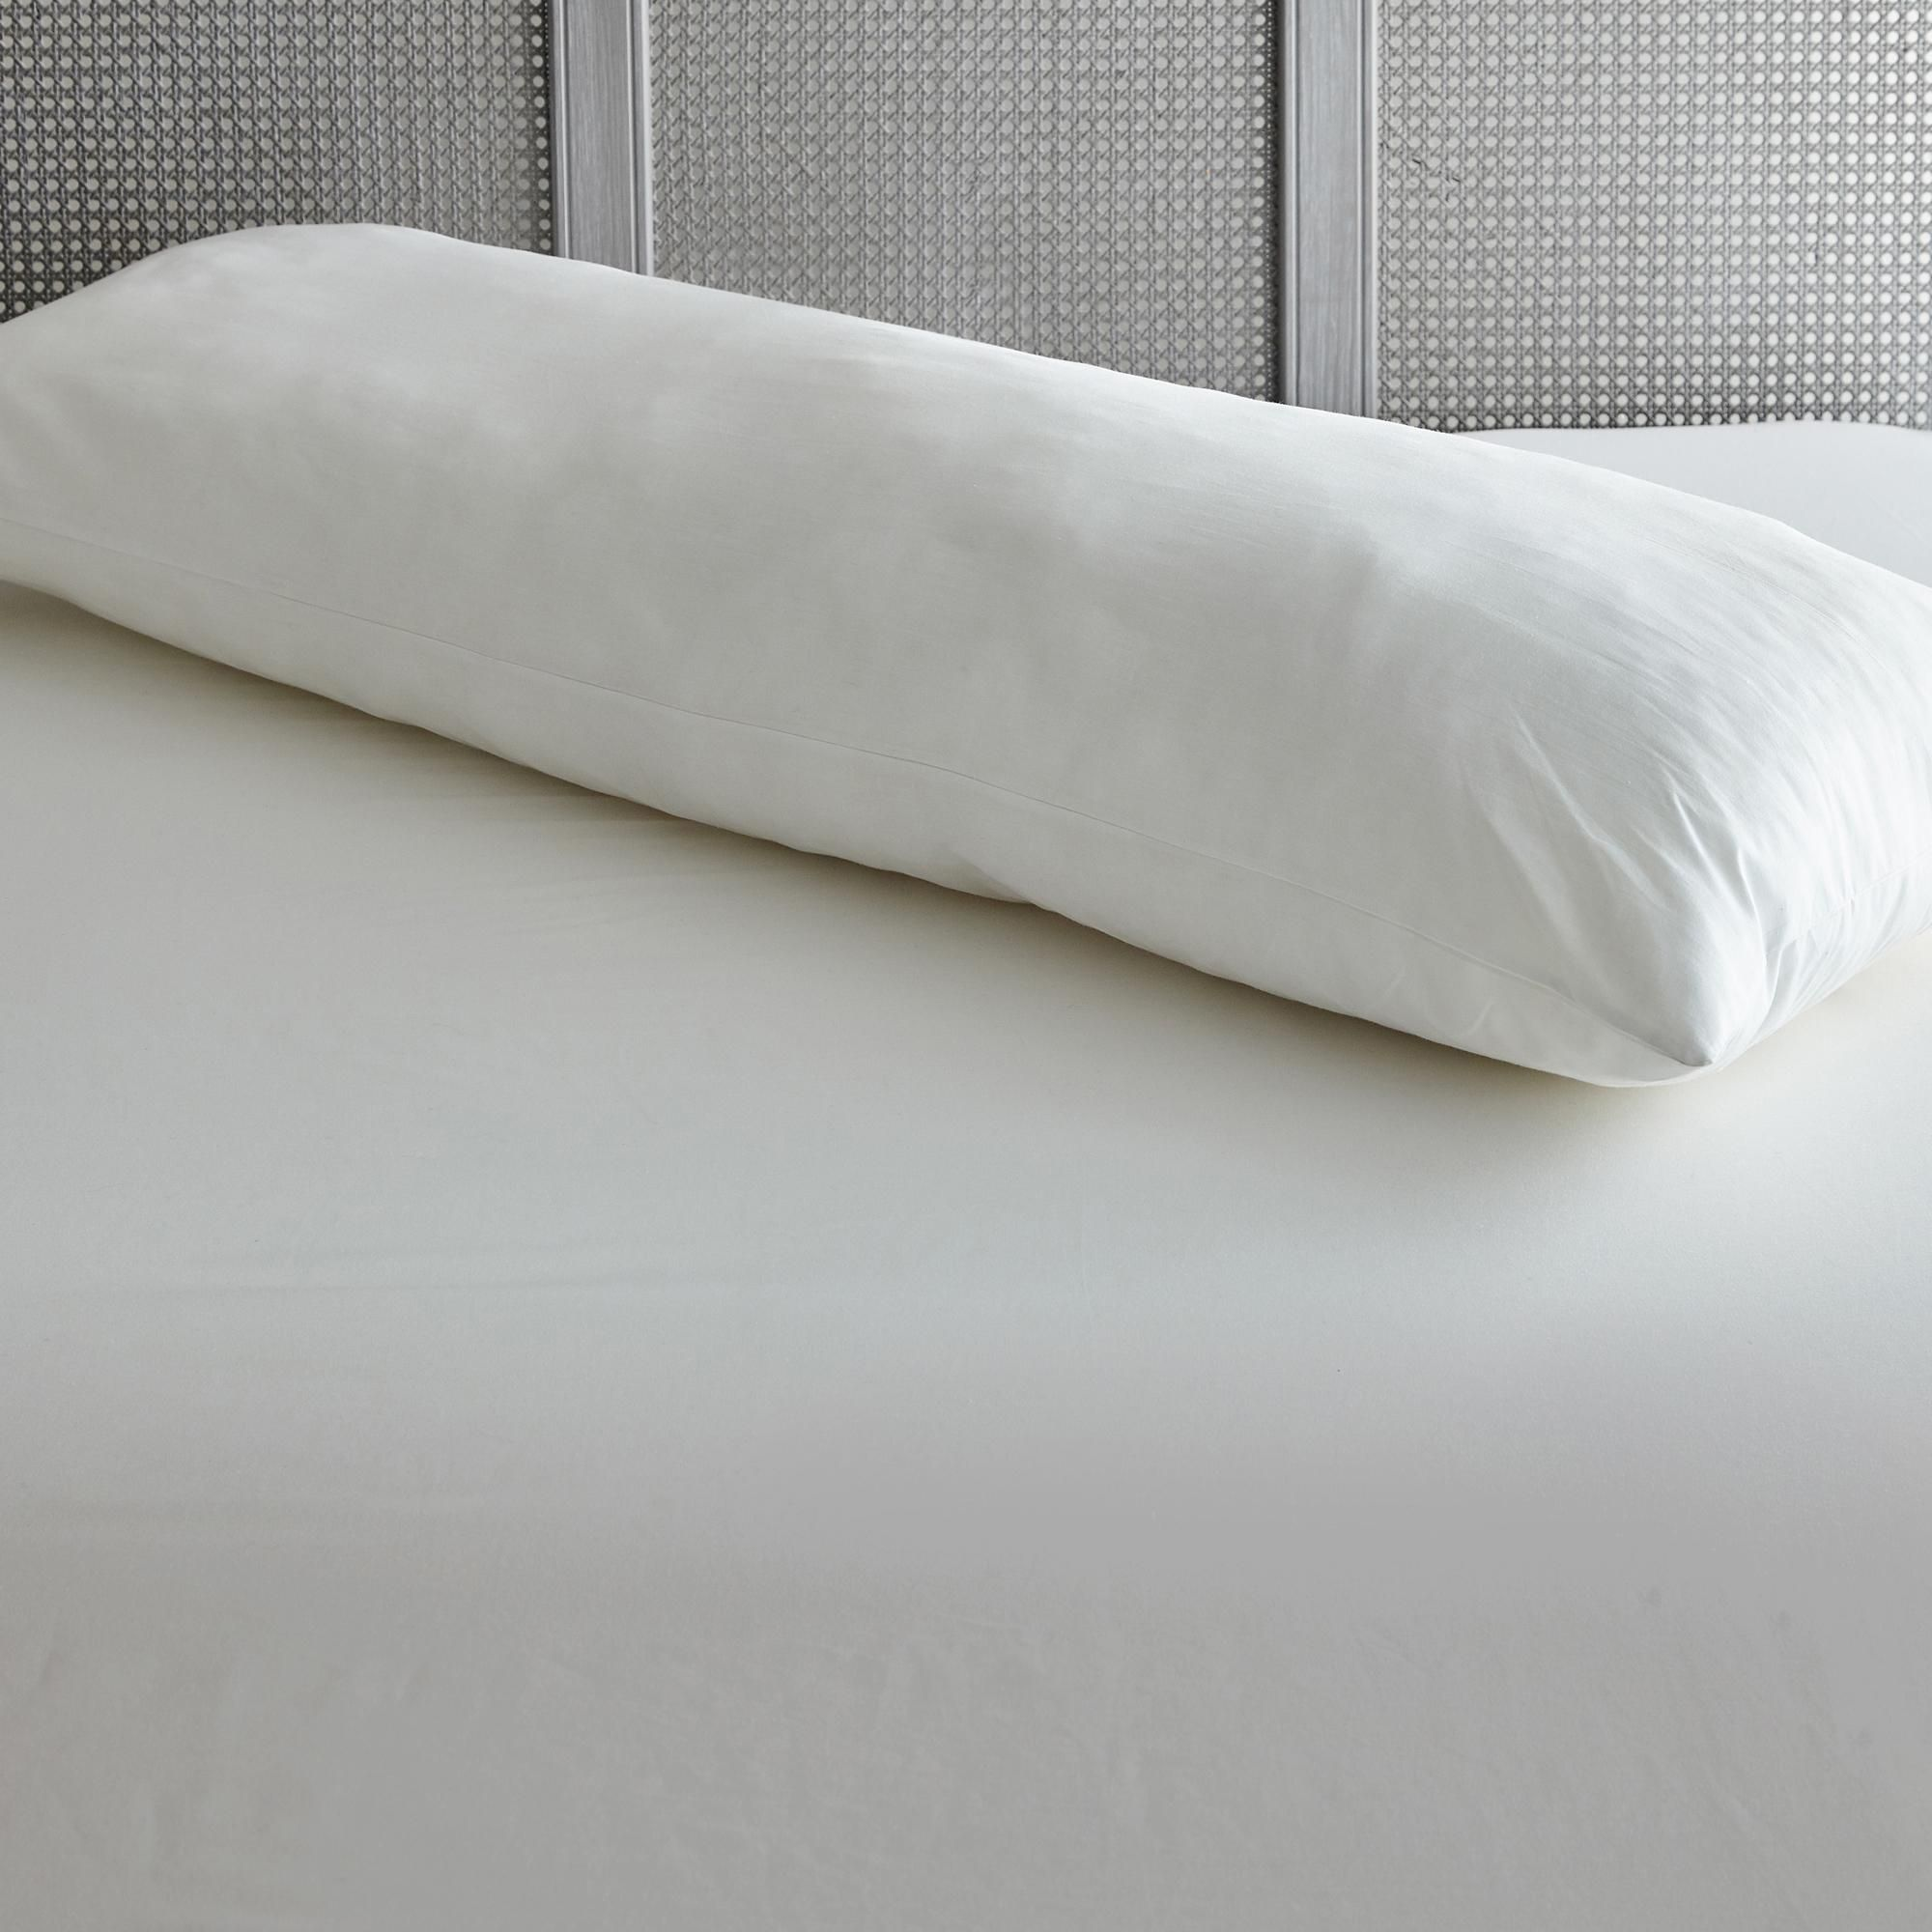 Non Allergenic Bolster Pillow